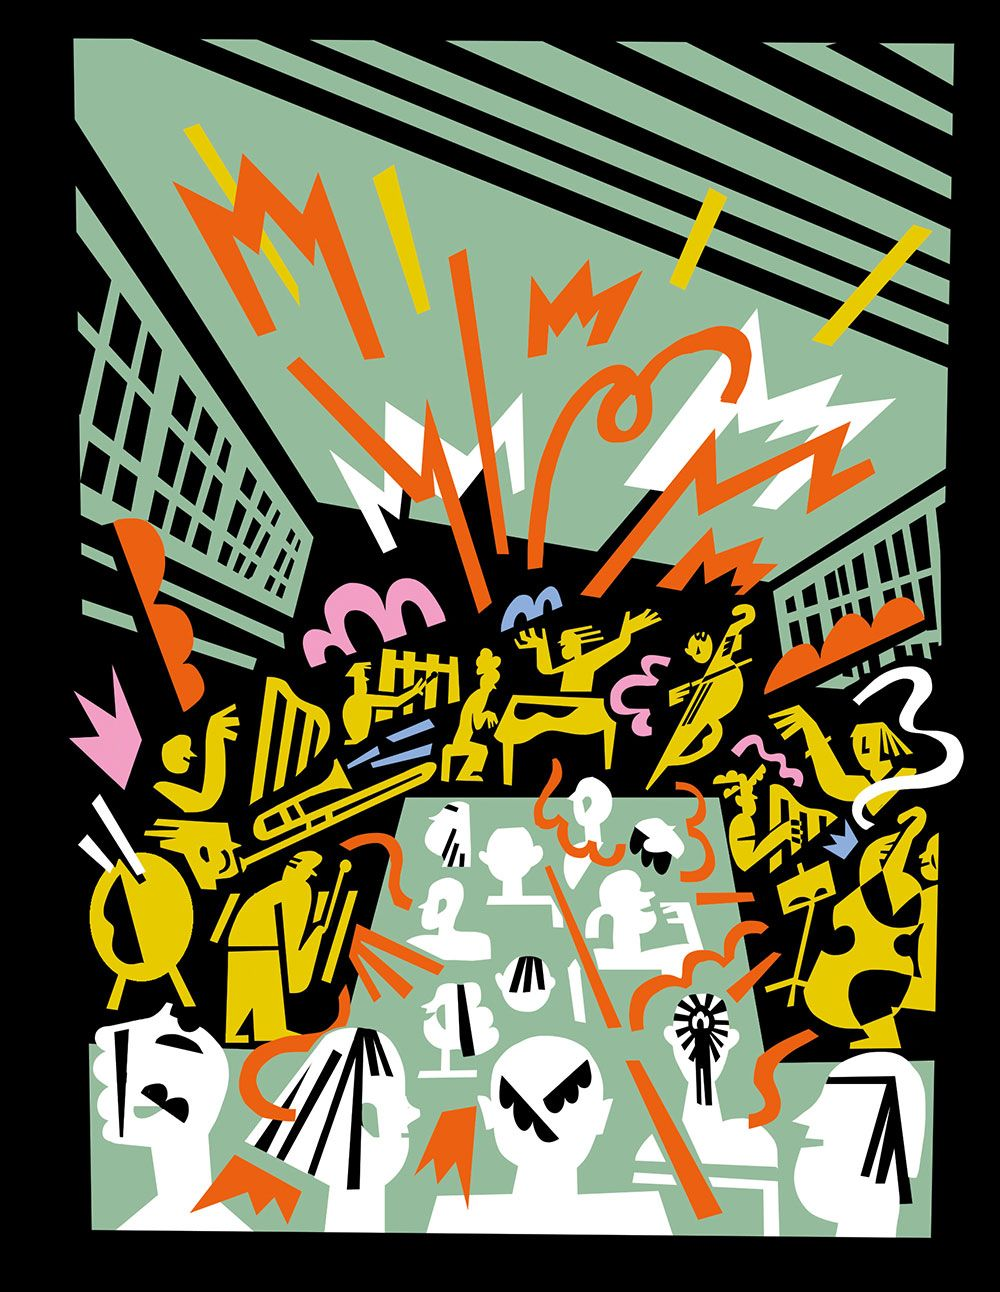 Illustration von Kati Szilagyi für das Elbphilharmonie Magazin